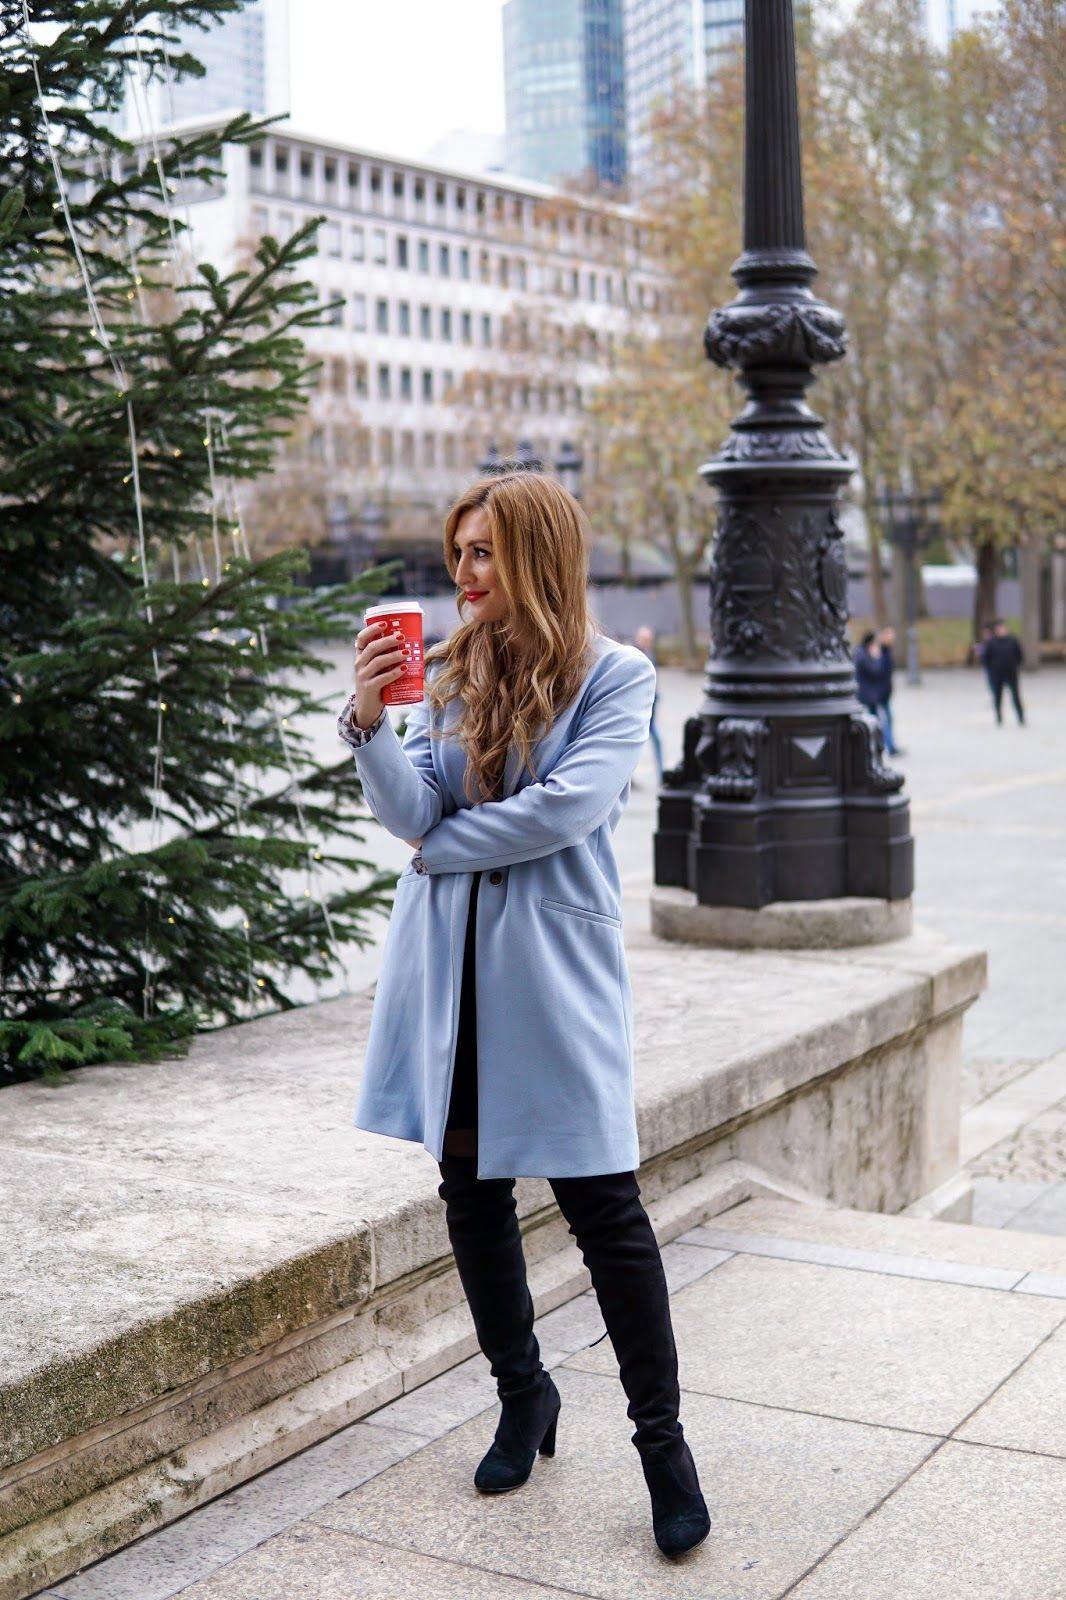 Weihnachtsfeier Outfit Frau